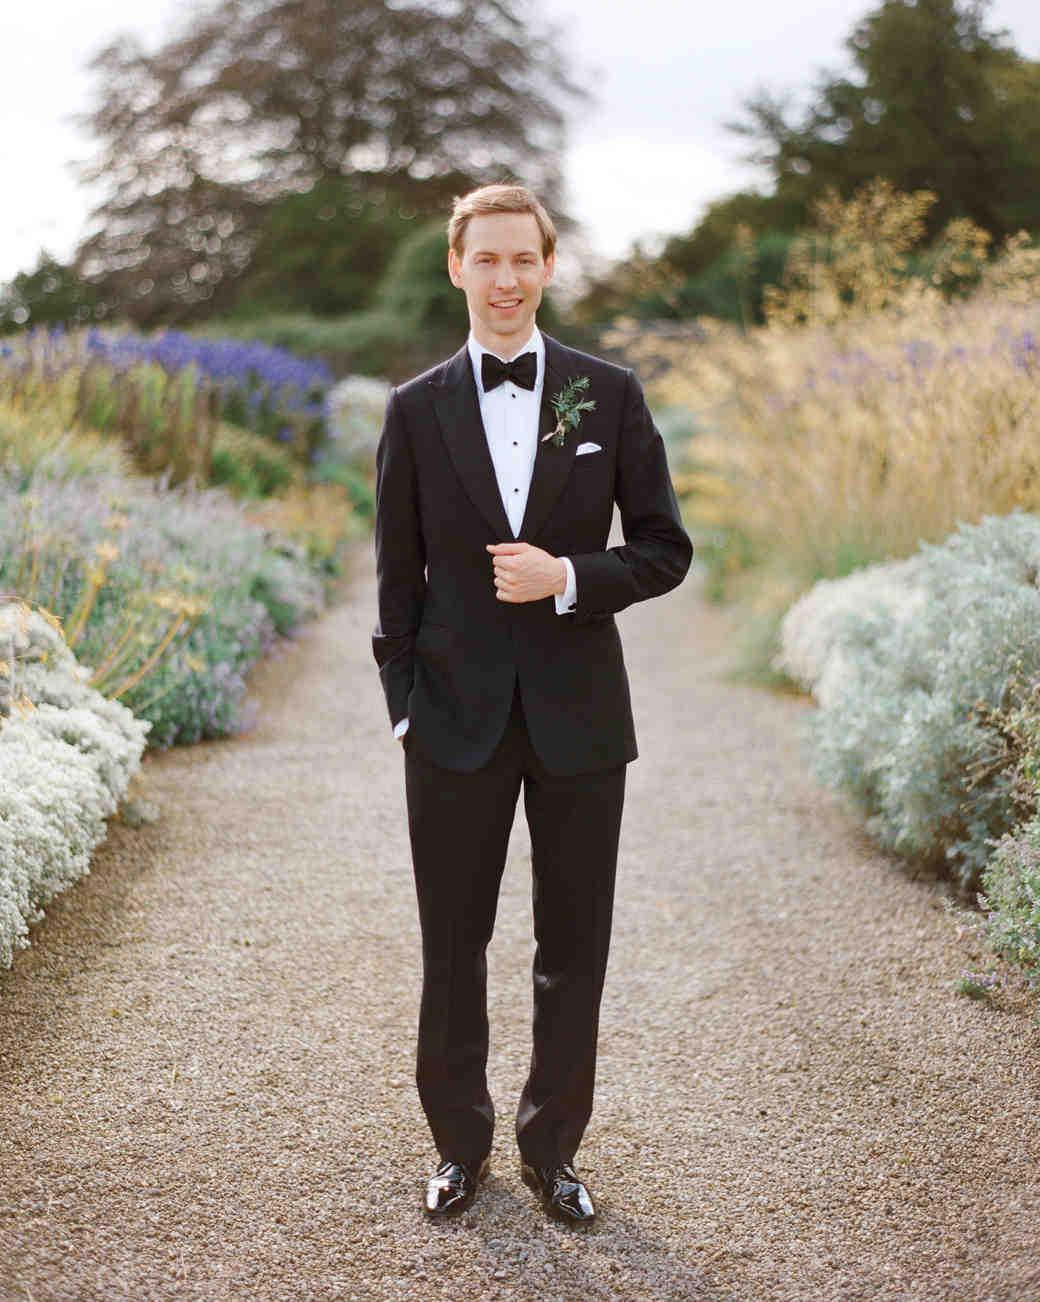 jo-andrew-wedding-ireland-1356-s112147.jpg